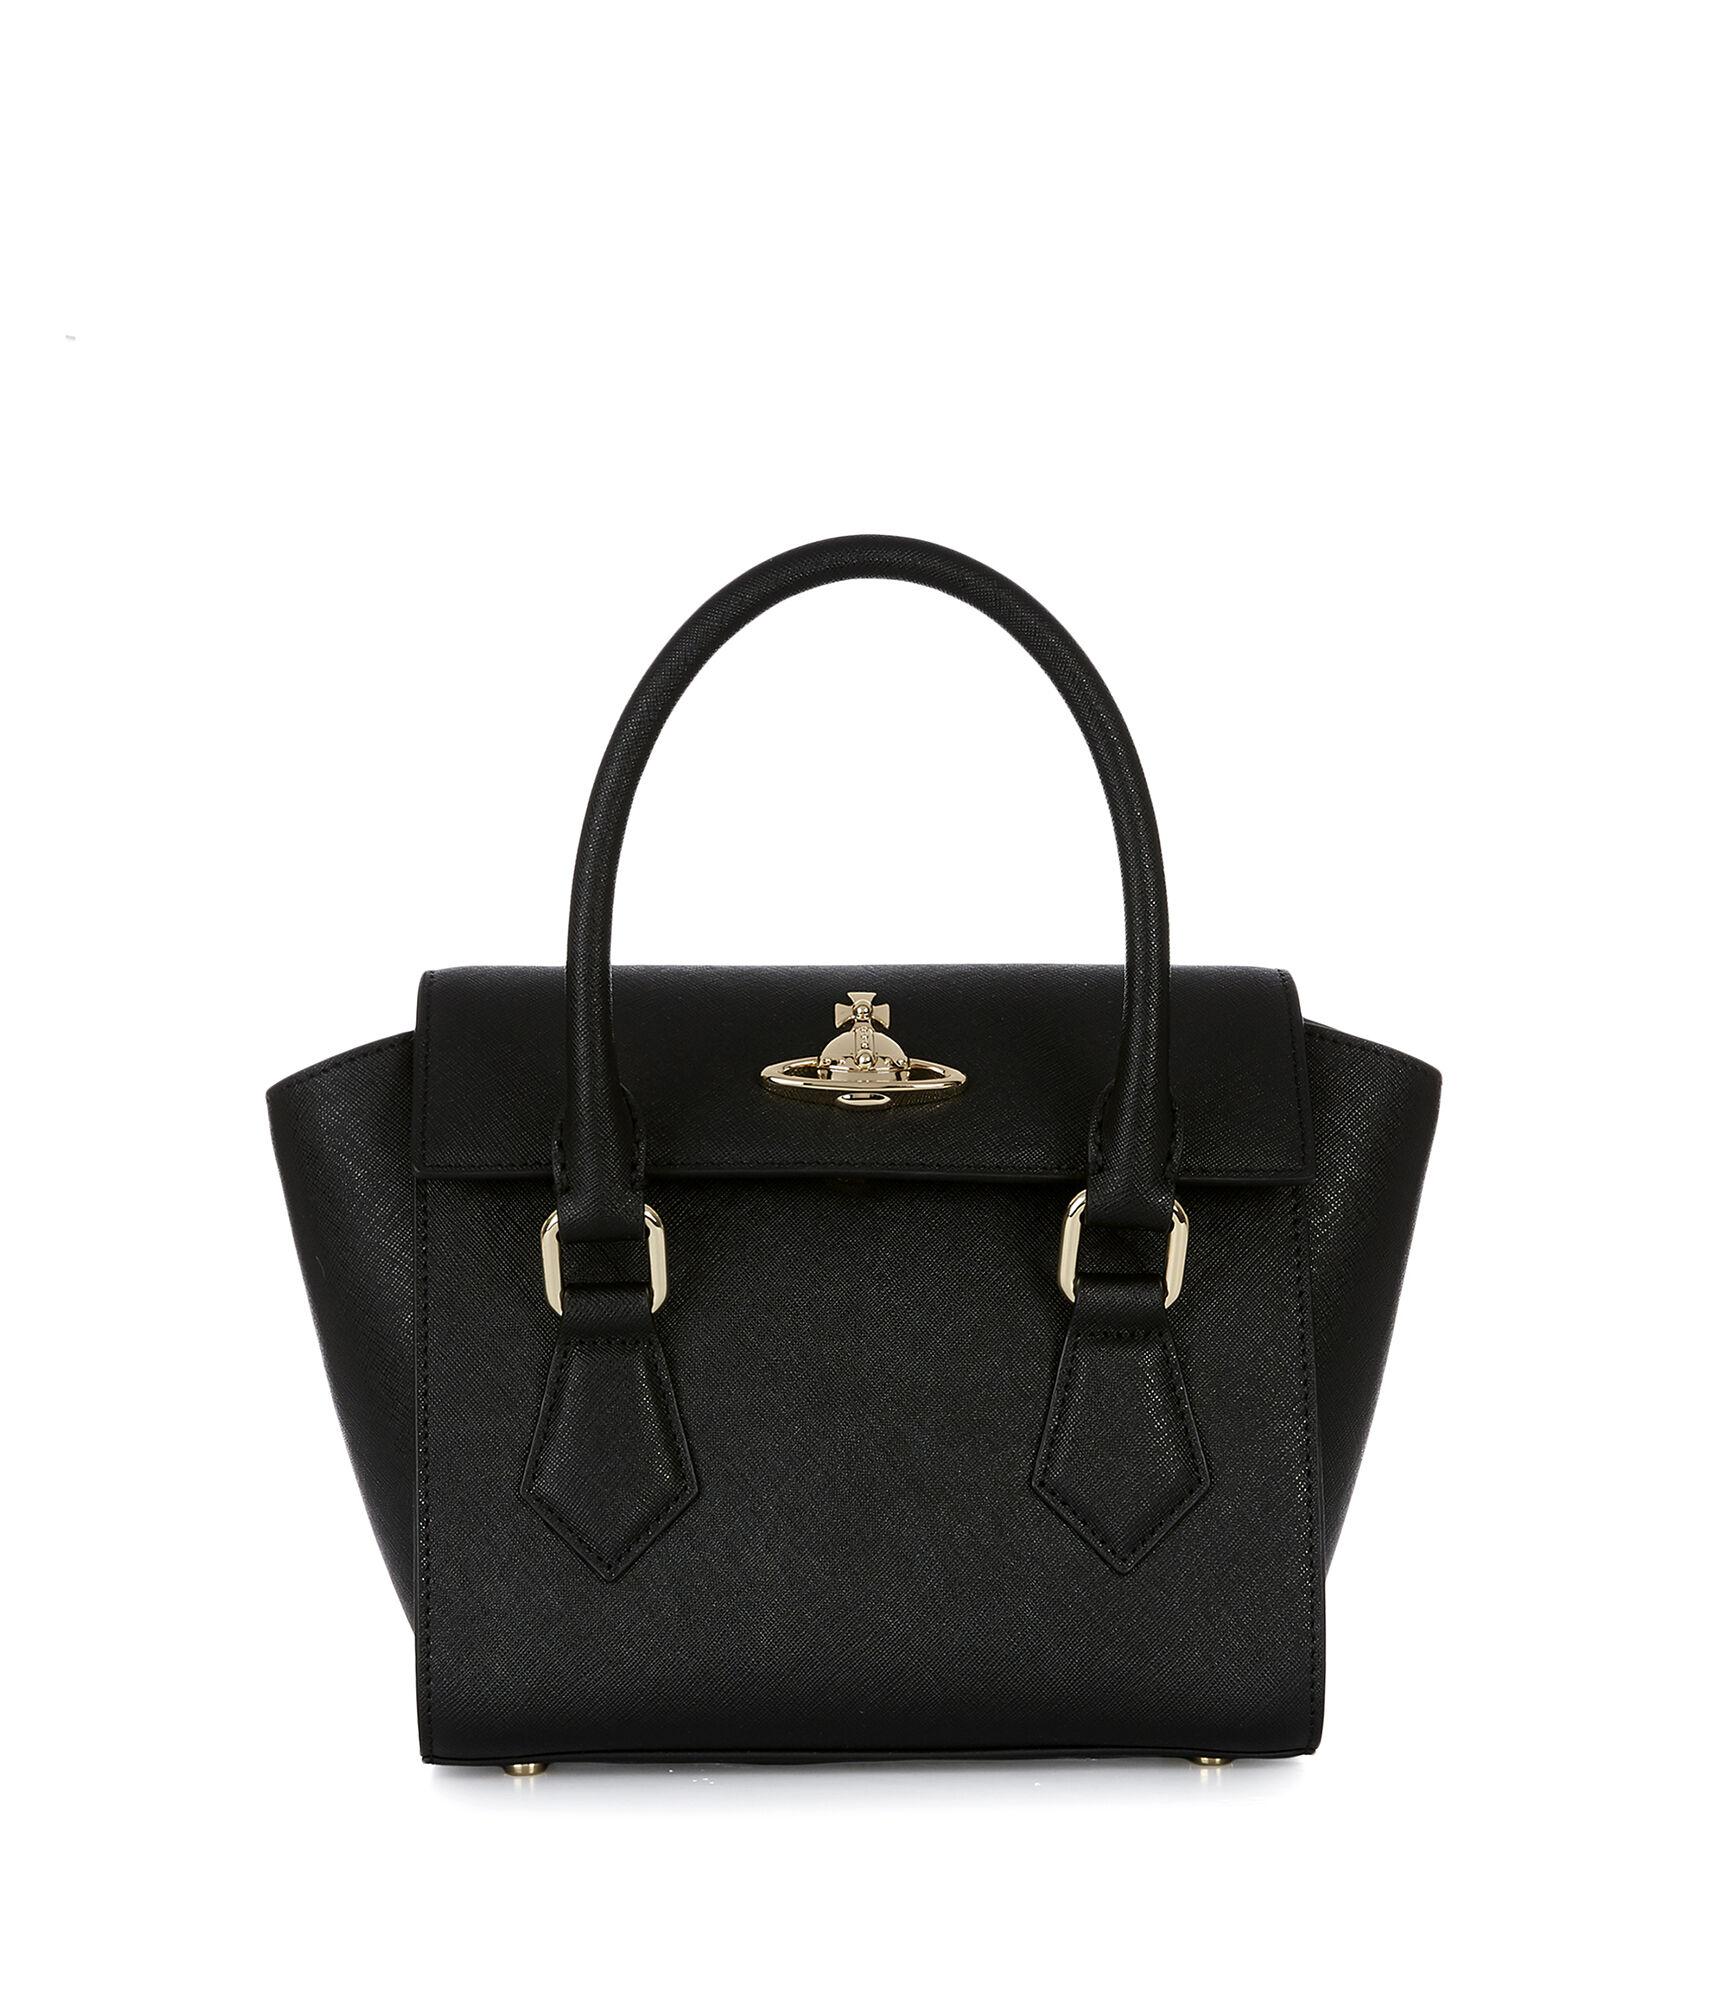 Vivienne Westwood Petit sac à main Pimlico kHkGYwUD